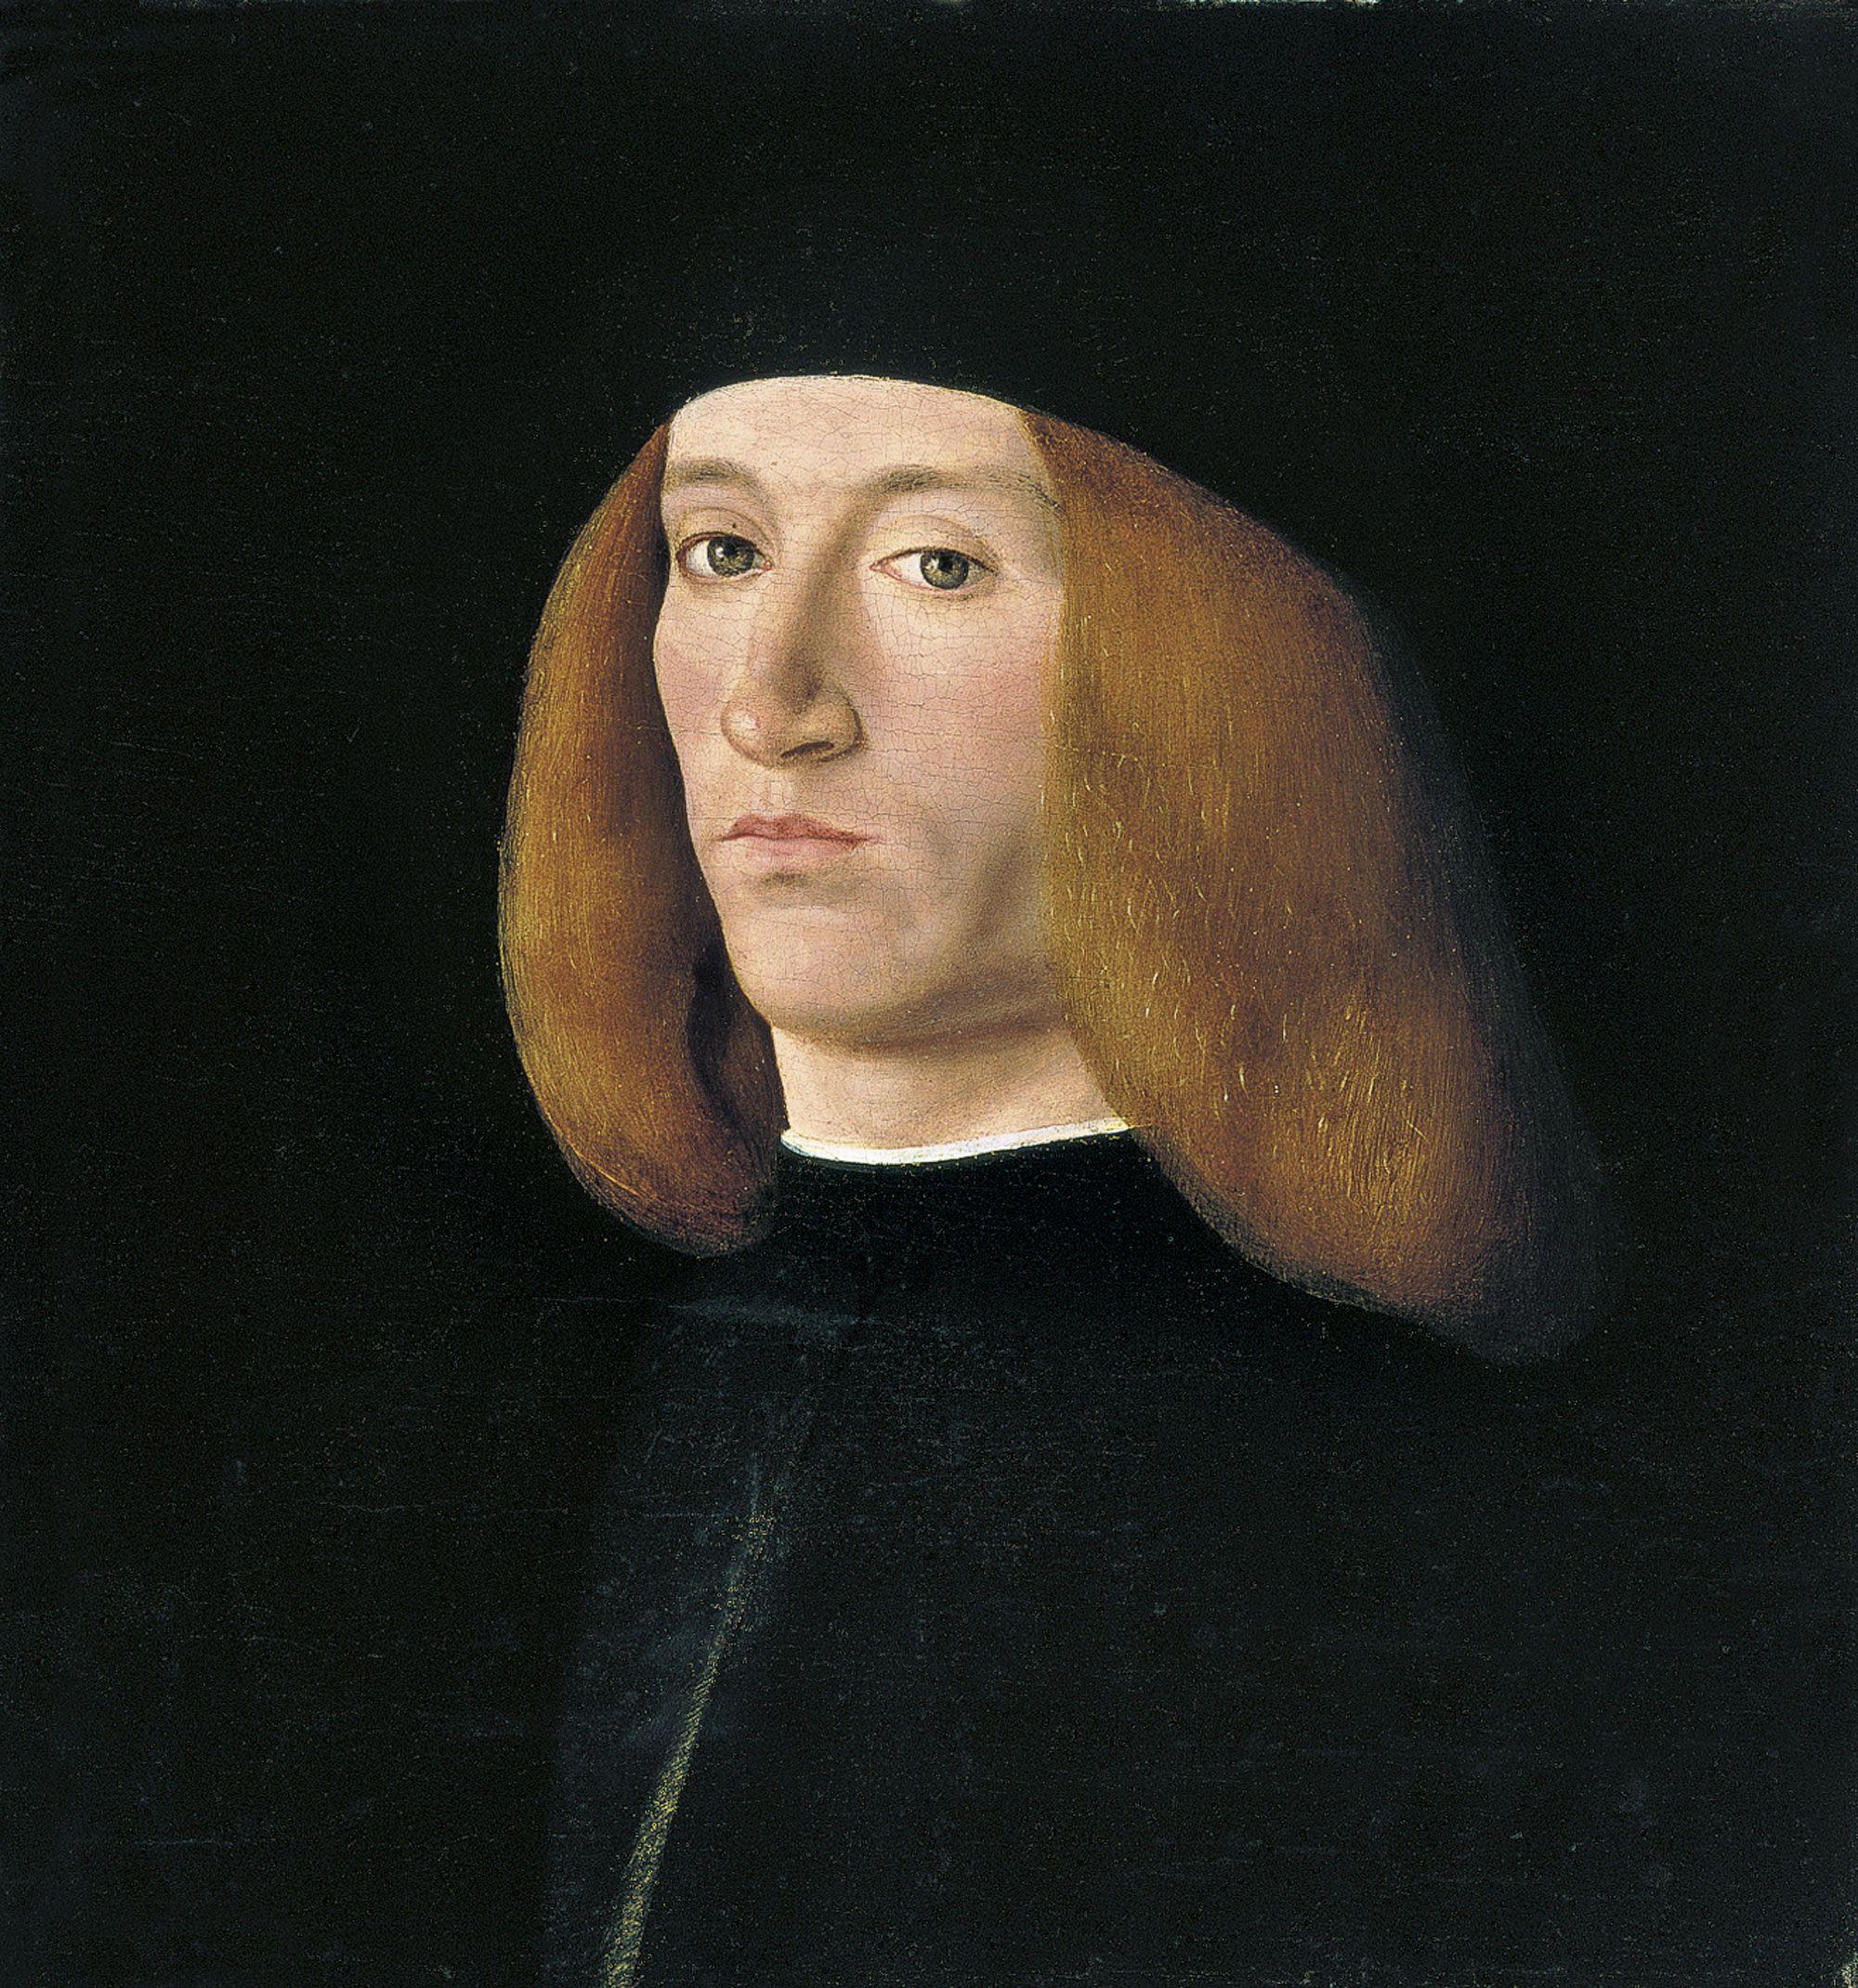 Andrea SOLARI (1460-1525) Portrait of a Young Man, after 1490 - Oil on panel; H. 31 cm, W. 28 cm, Thyssen-Bornemisza Museum